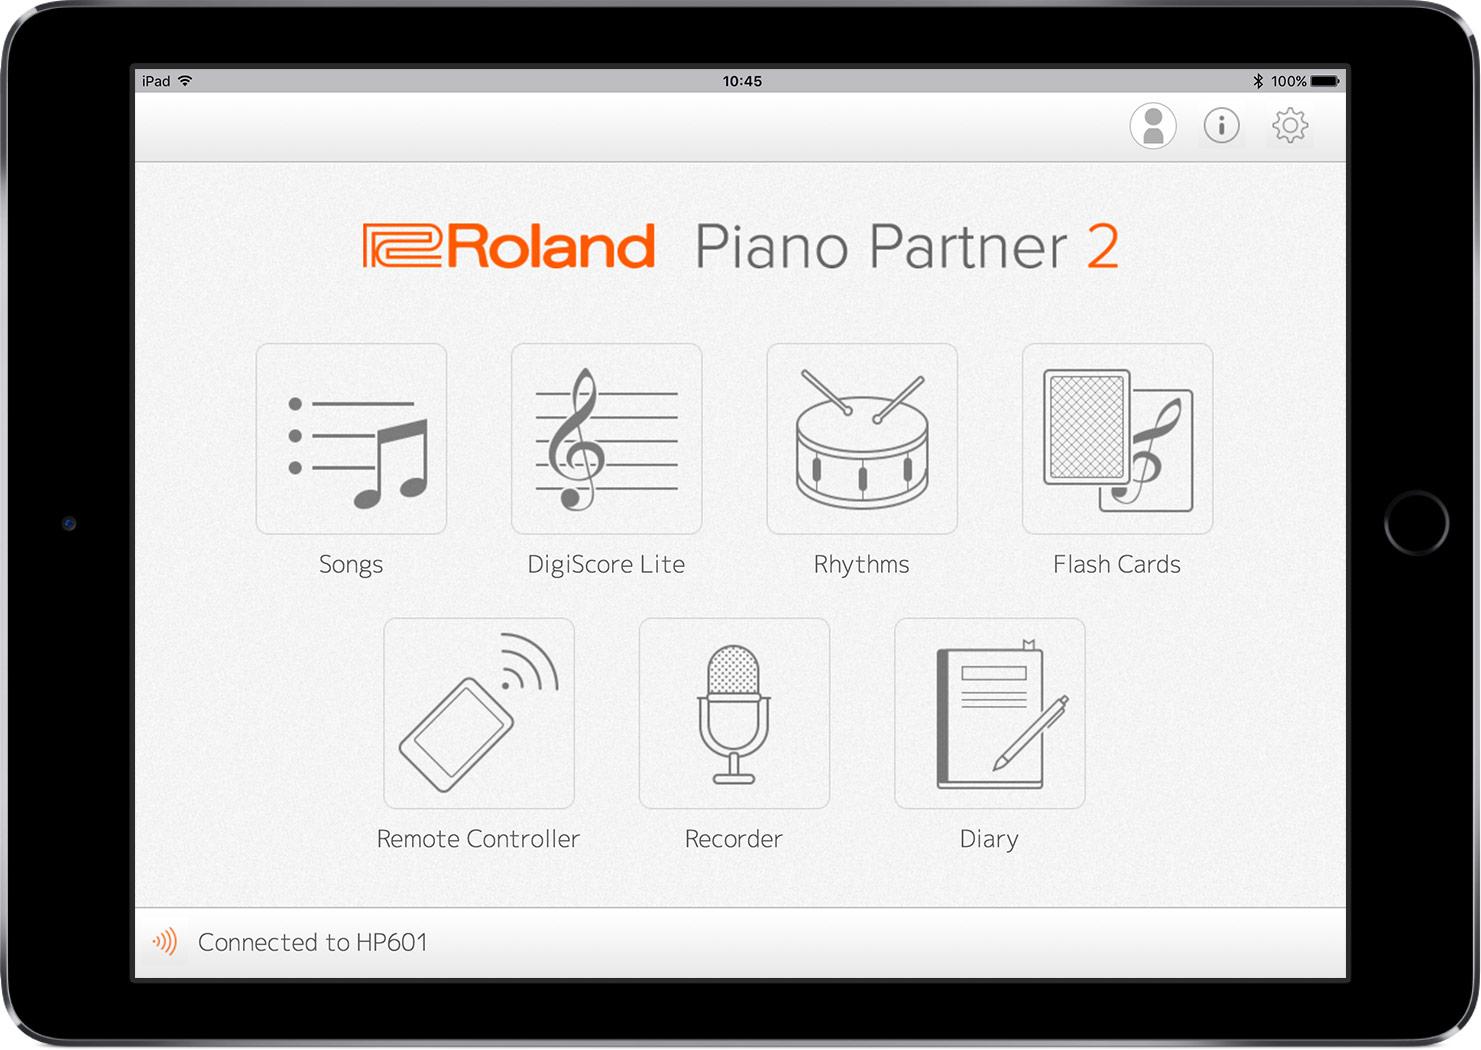 Piano Partner 2 Version 2.0